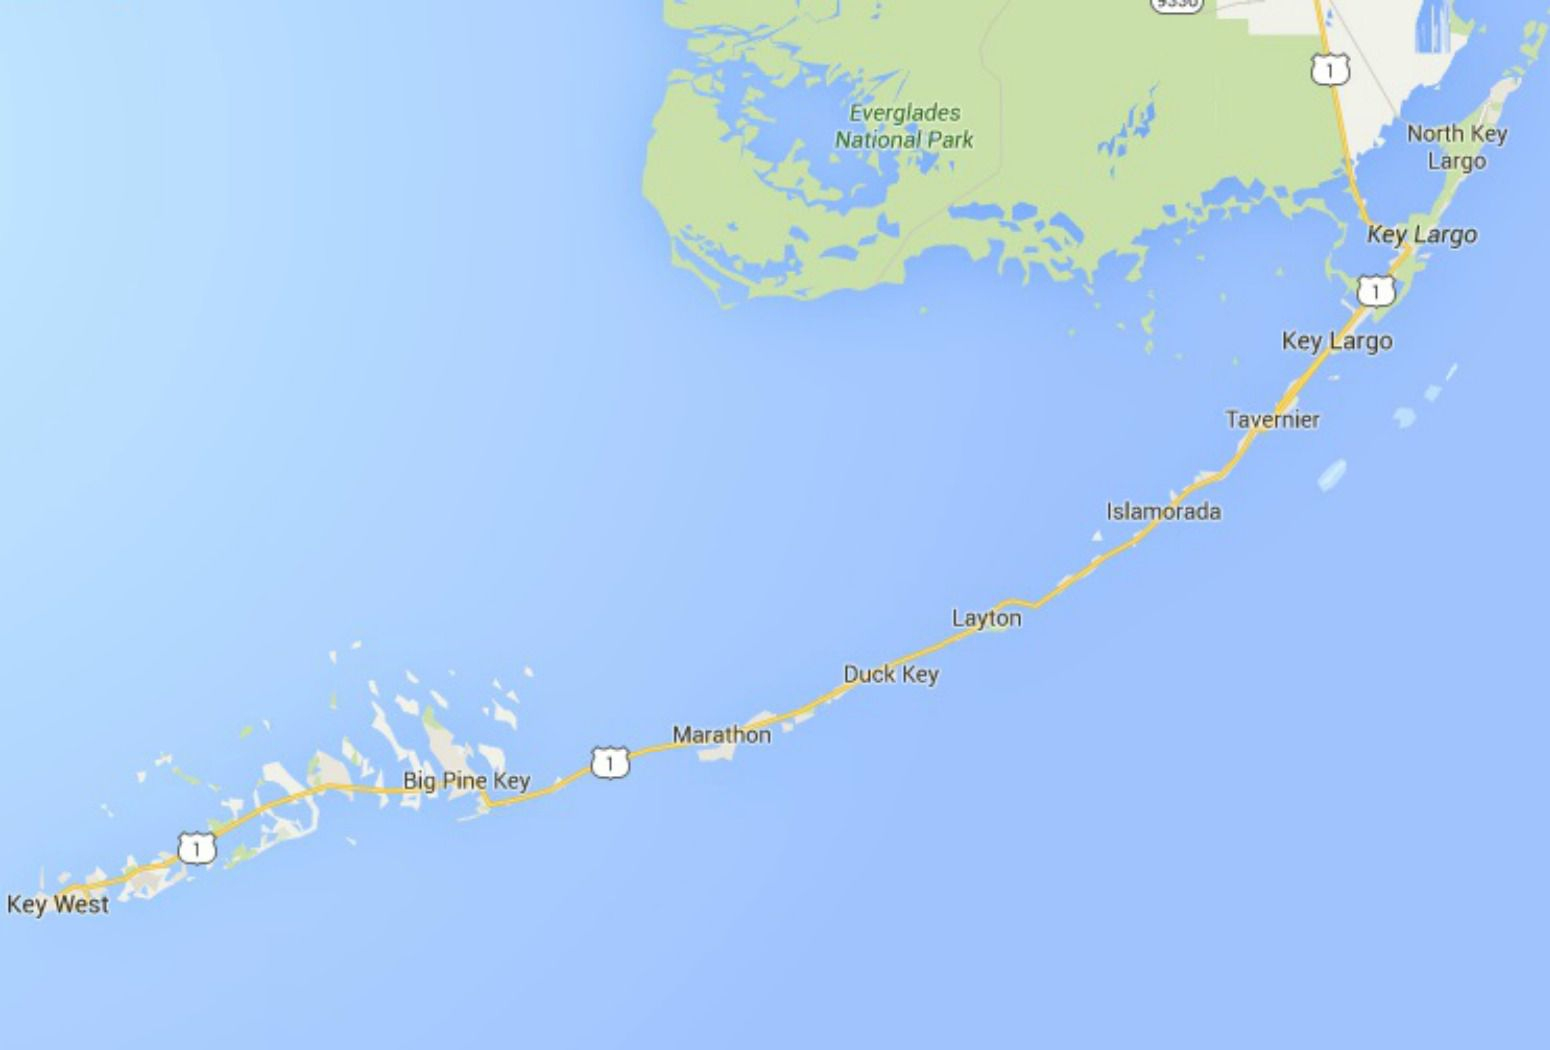 Maps Of Florida: Orlando, Tampa, Miami, Keys, And More - Florida Keys Map